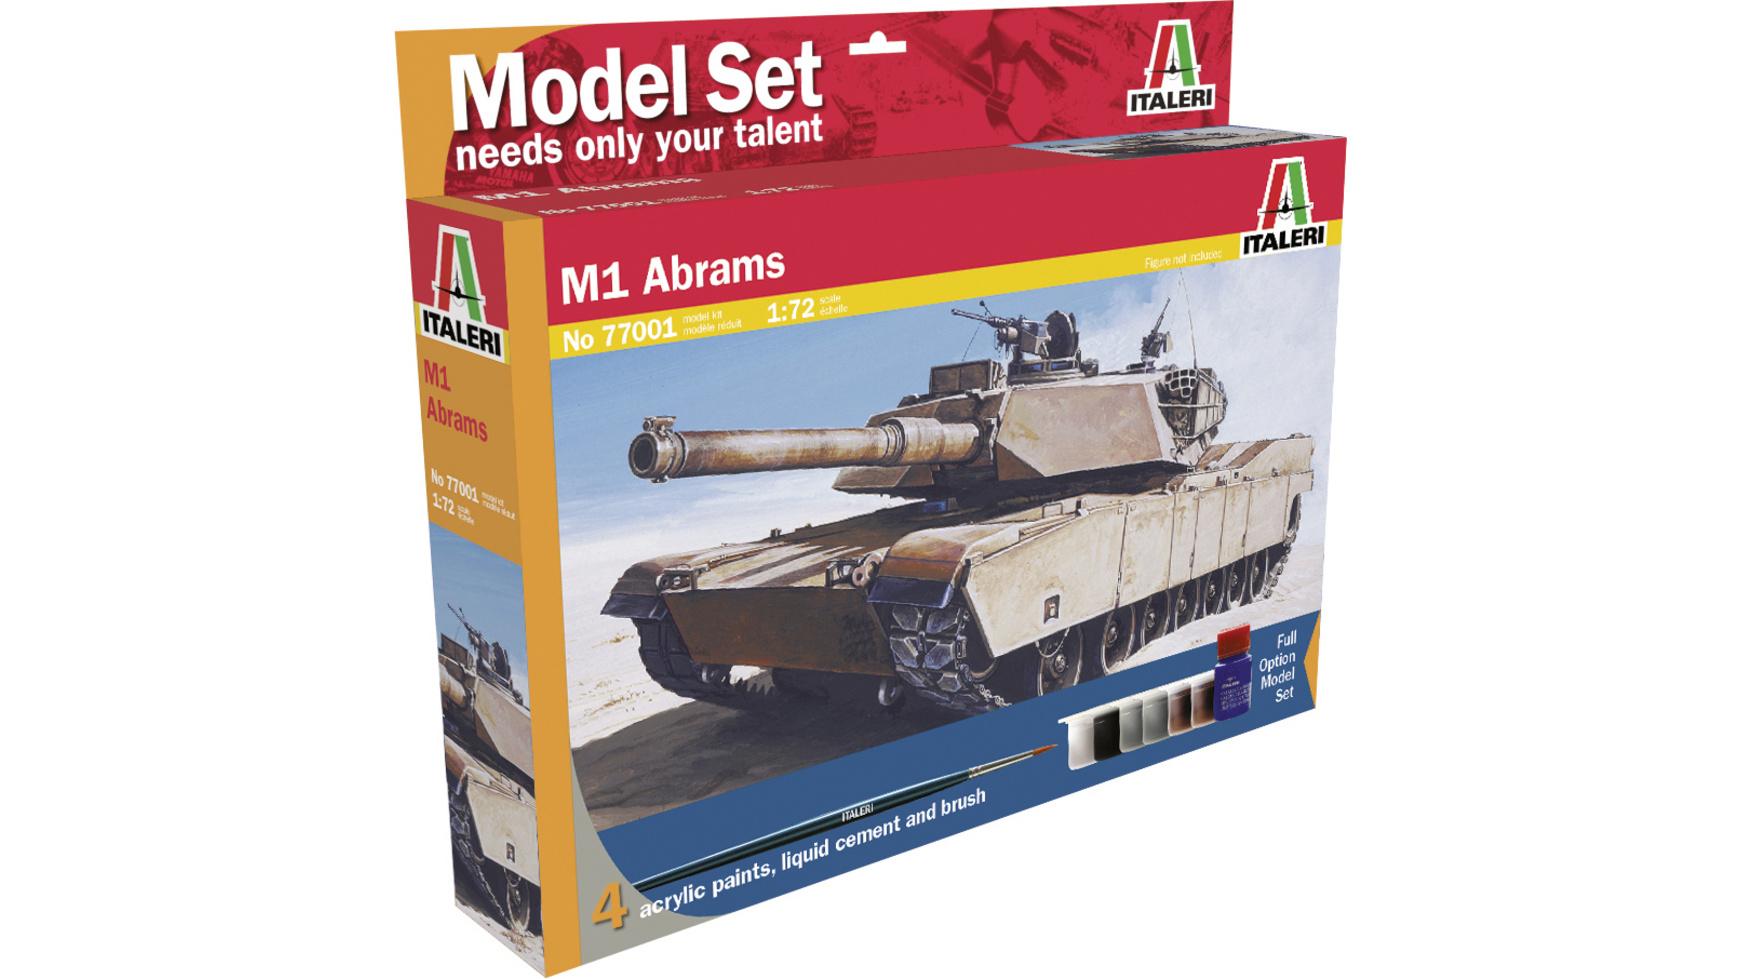 [Müller] Italeri 77001 M1 Abrams 1:72 Modellbausatz